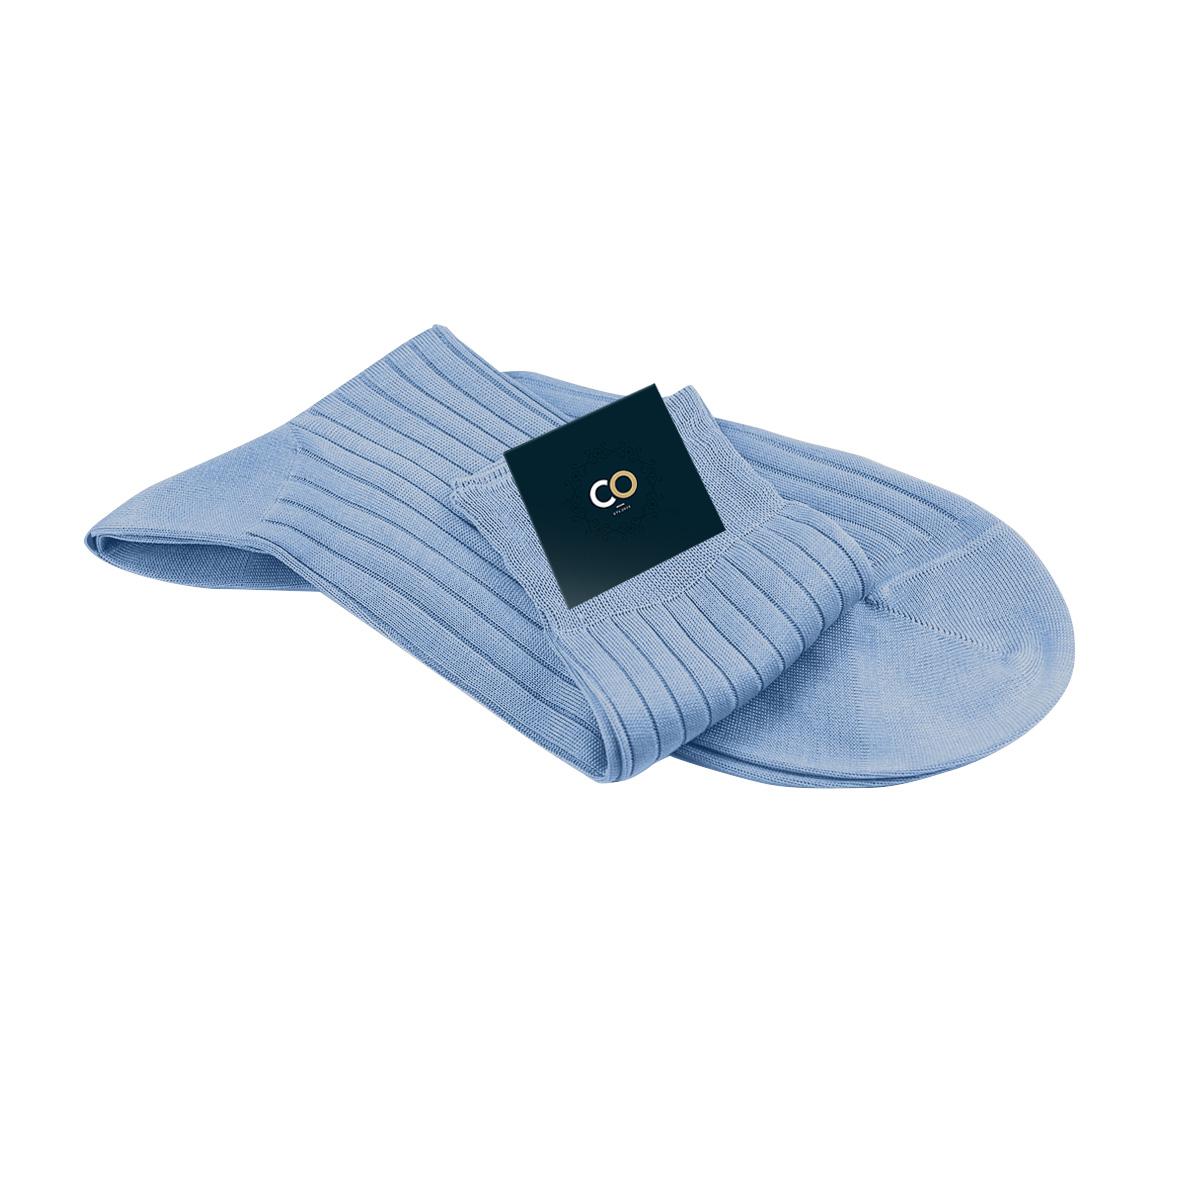 Chaussette bleu layette, Briac